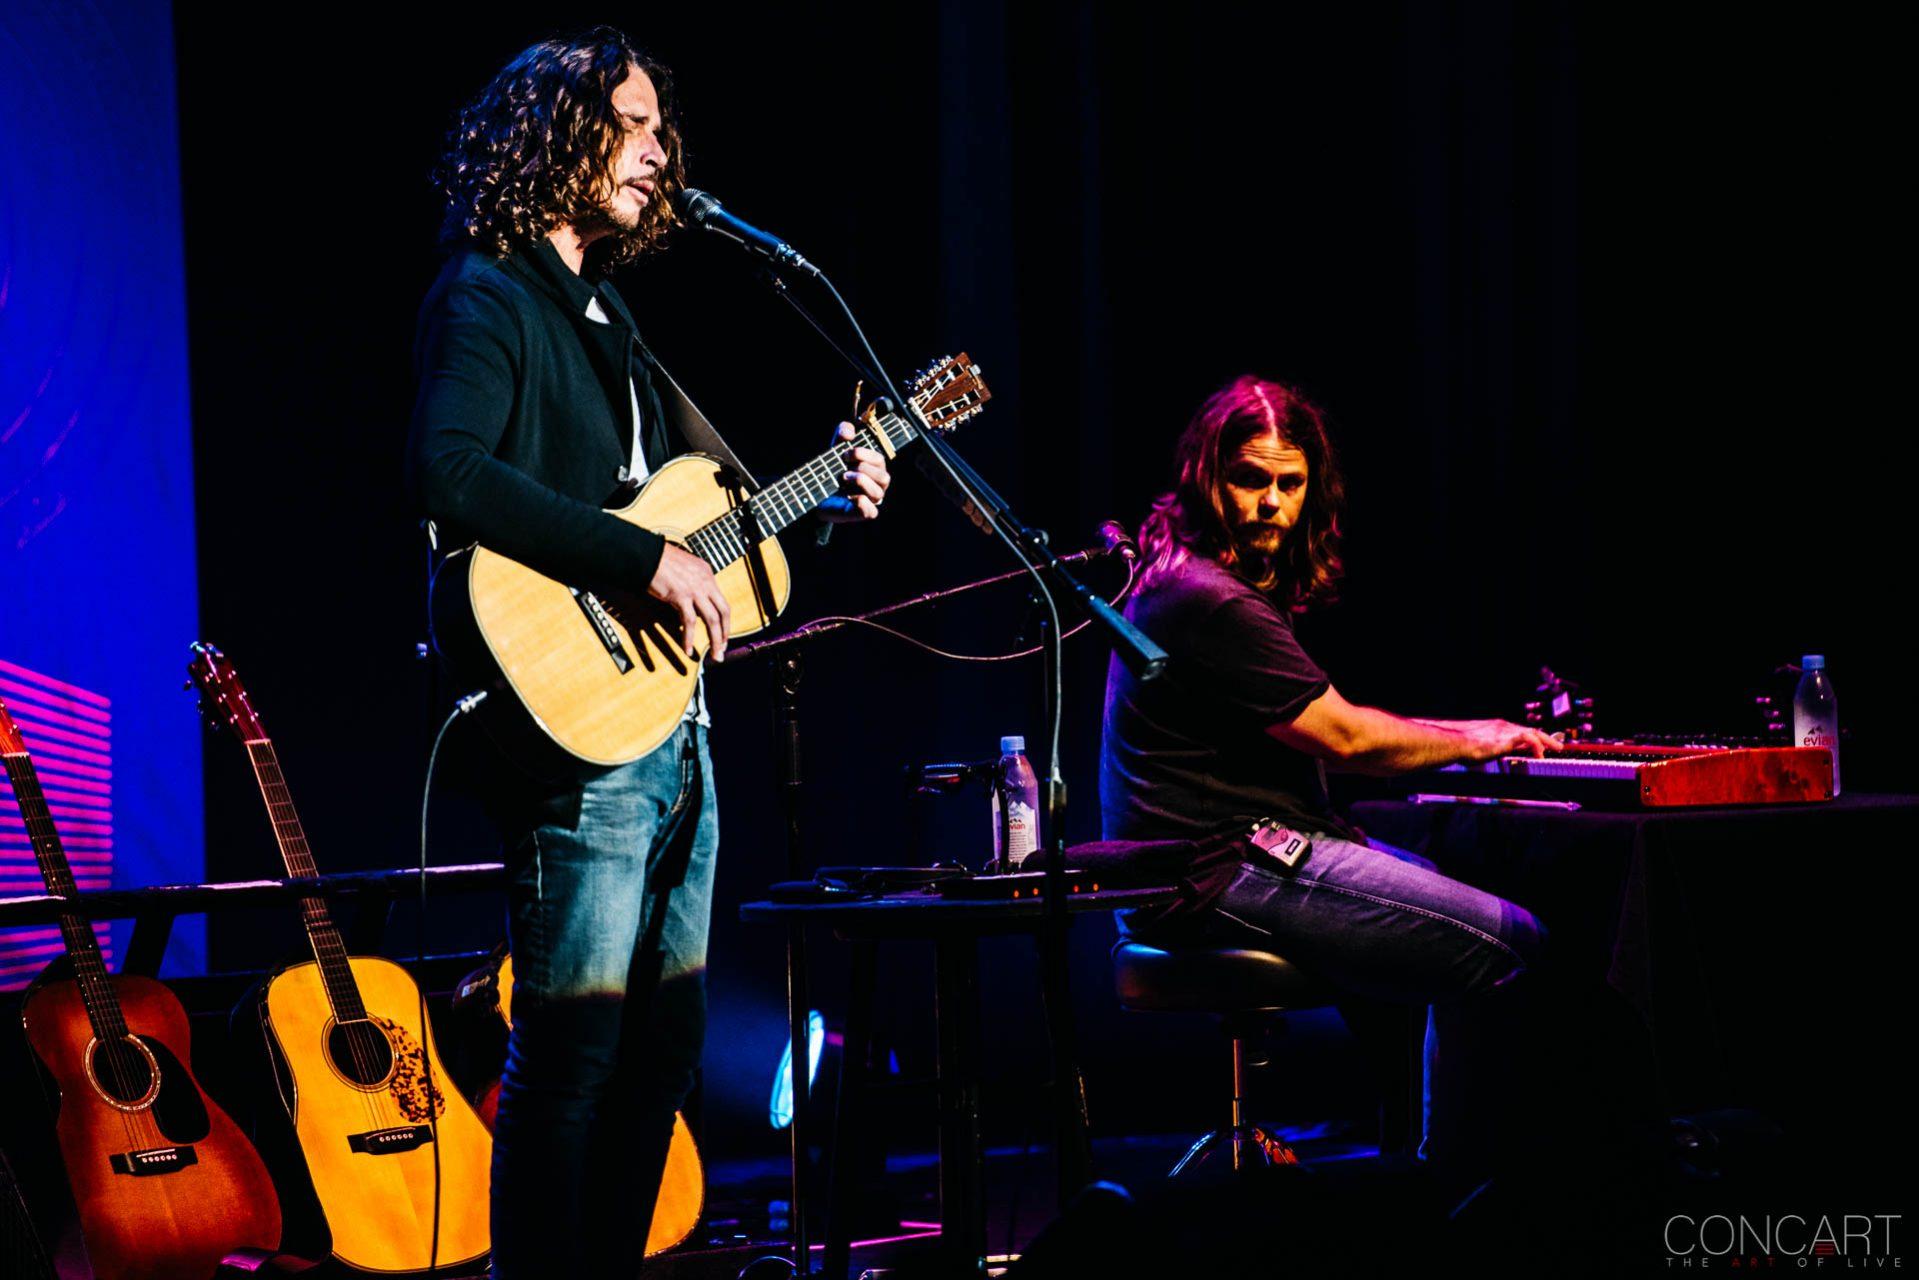 Chris Cornell photo by Sean Molin 22